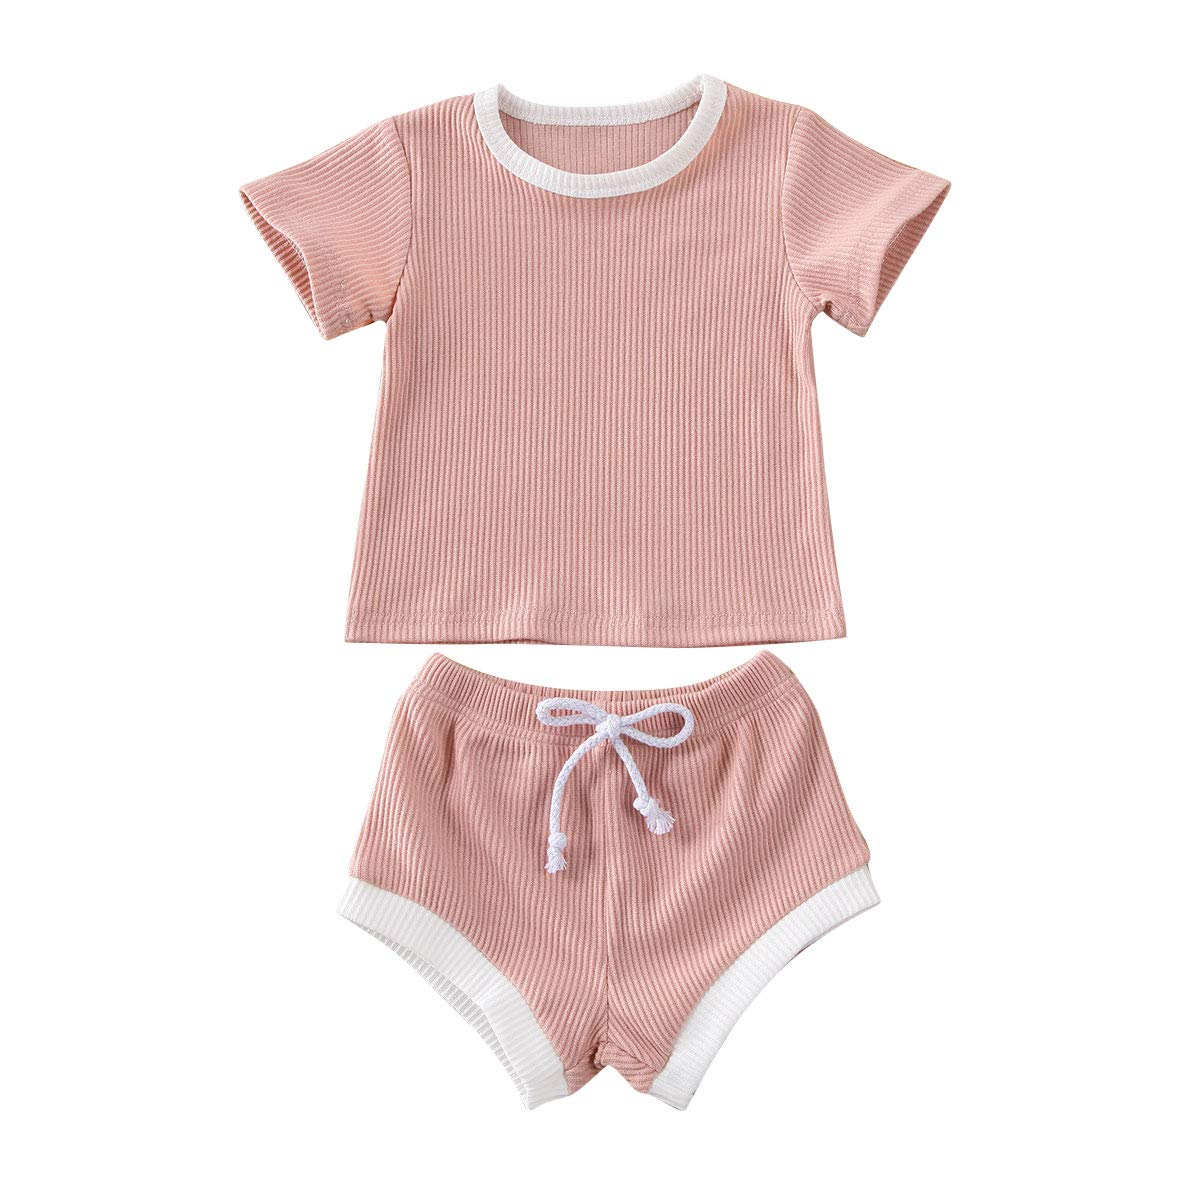 Toddler Baby Boys Girls Ribbed Clothes Sleeveless Tank Tops Drawstring Shorts 2Pcs Solid Outfits Set